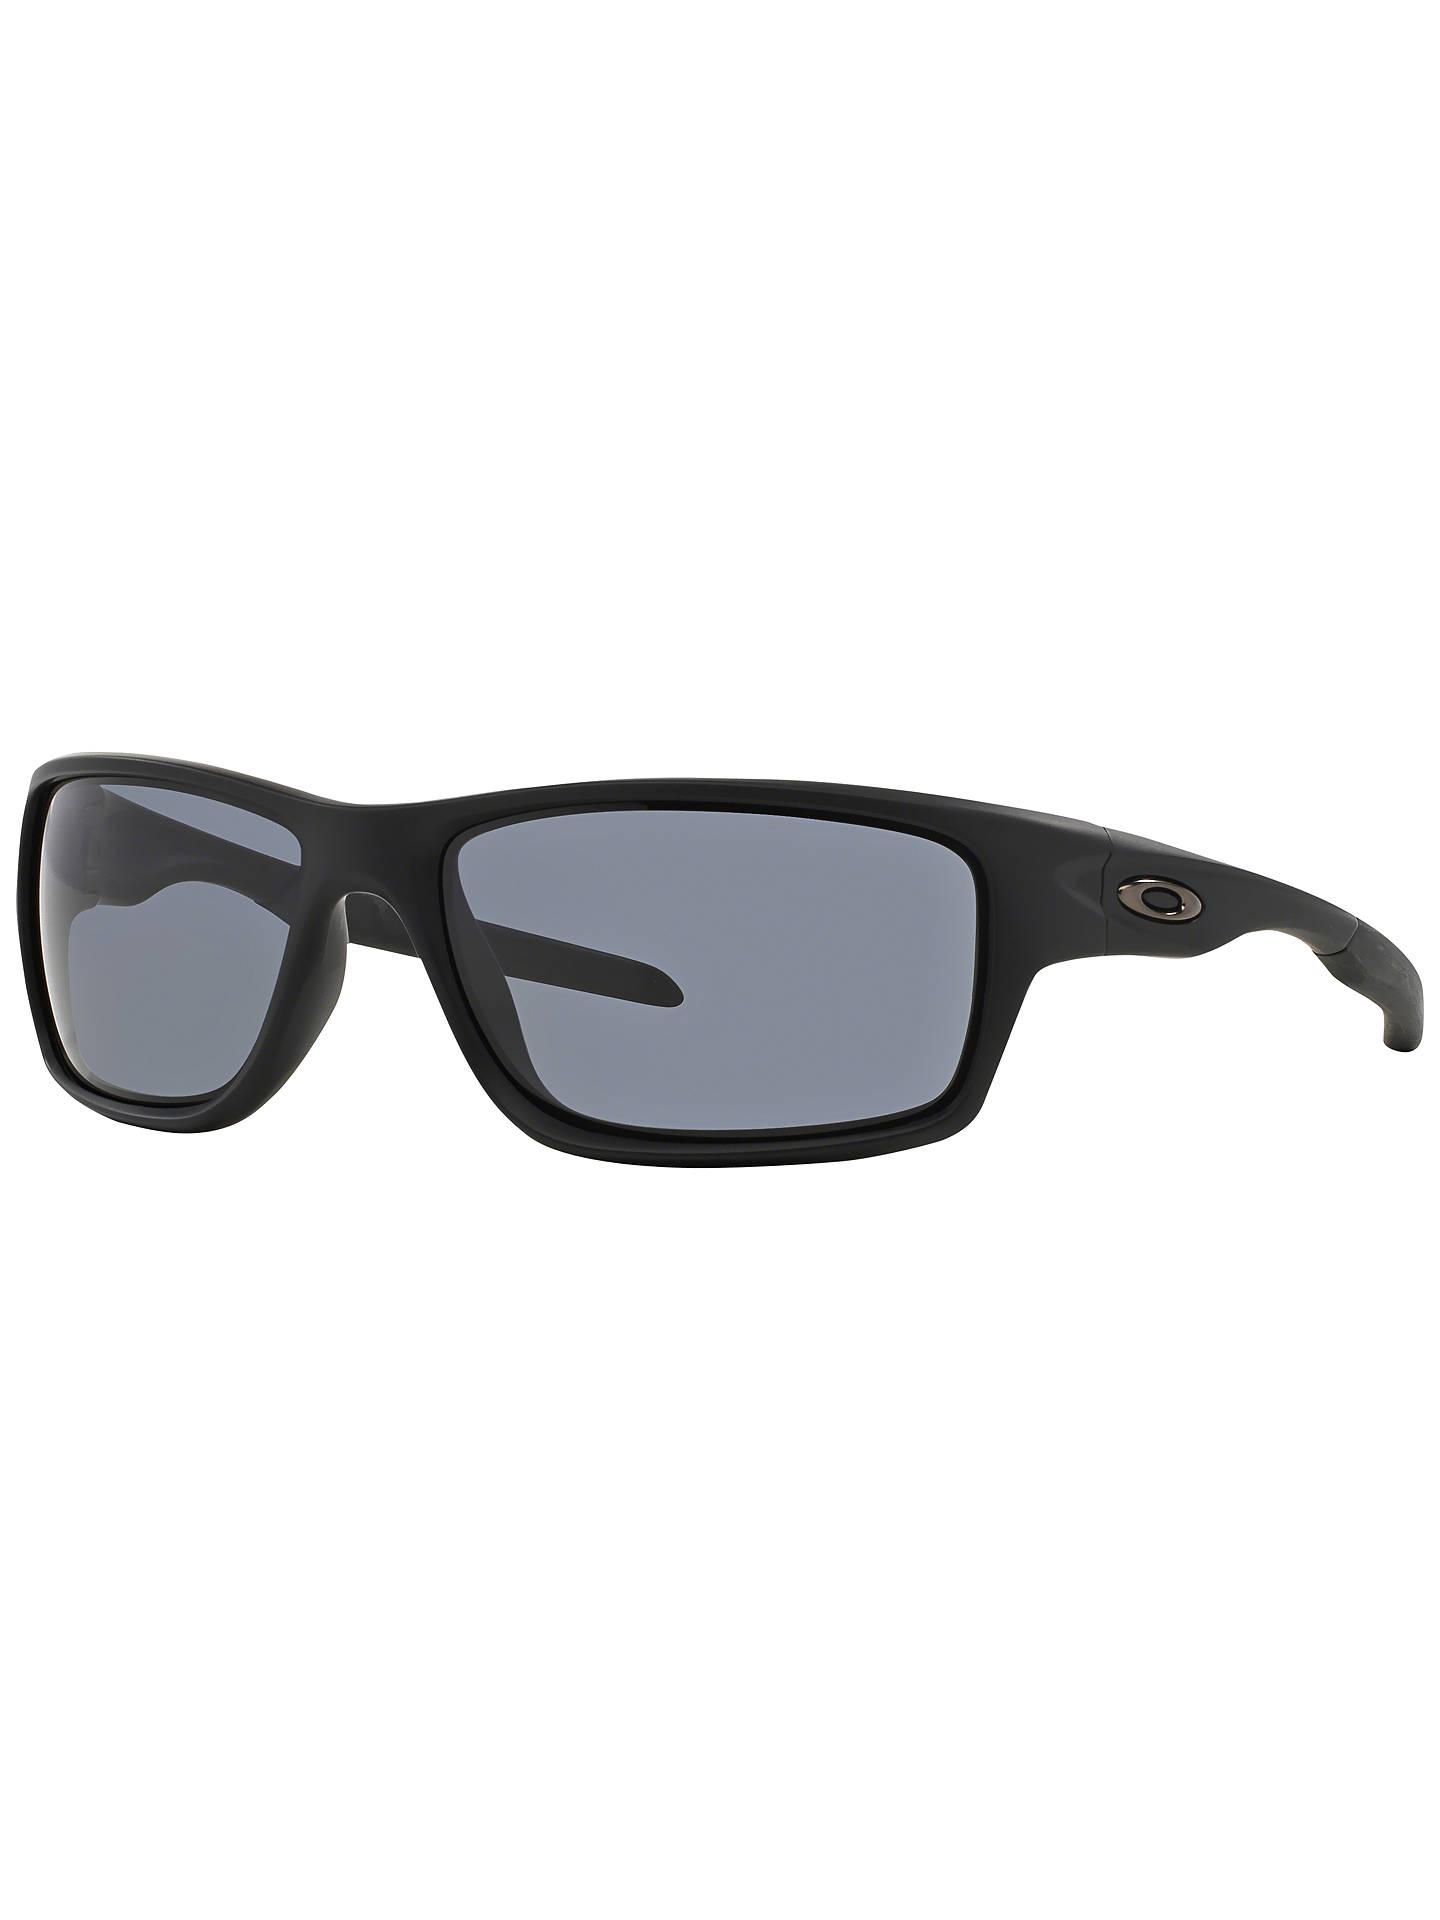 5ce6fcb9af4 BuyOakley OO9225 Canteen Sunglasses